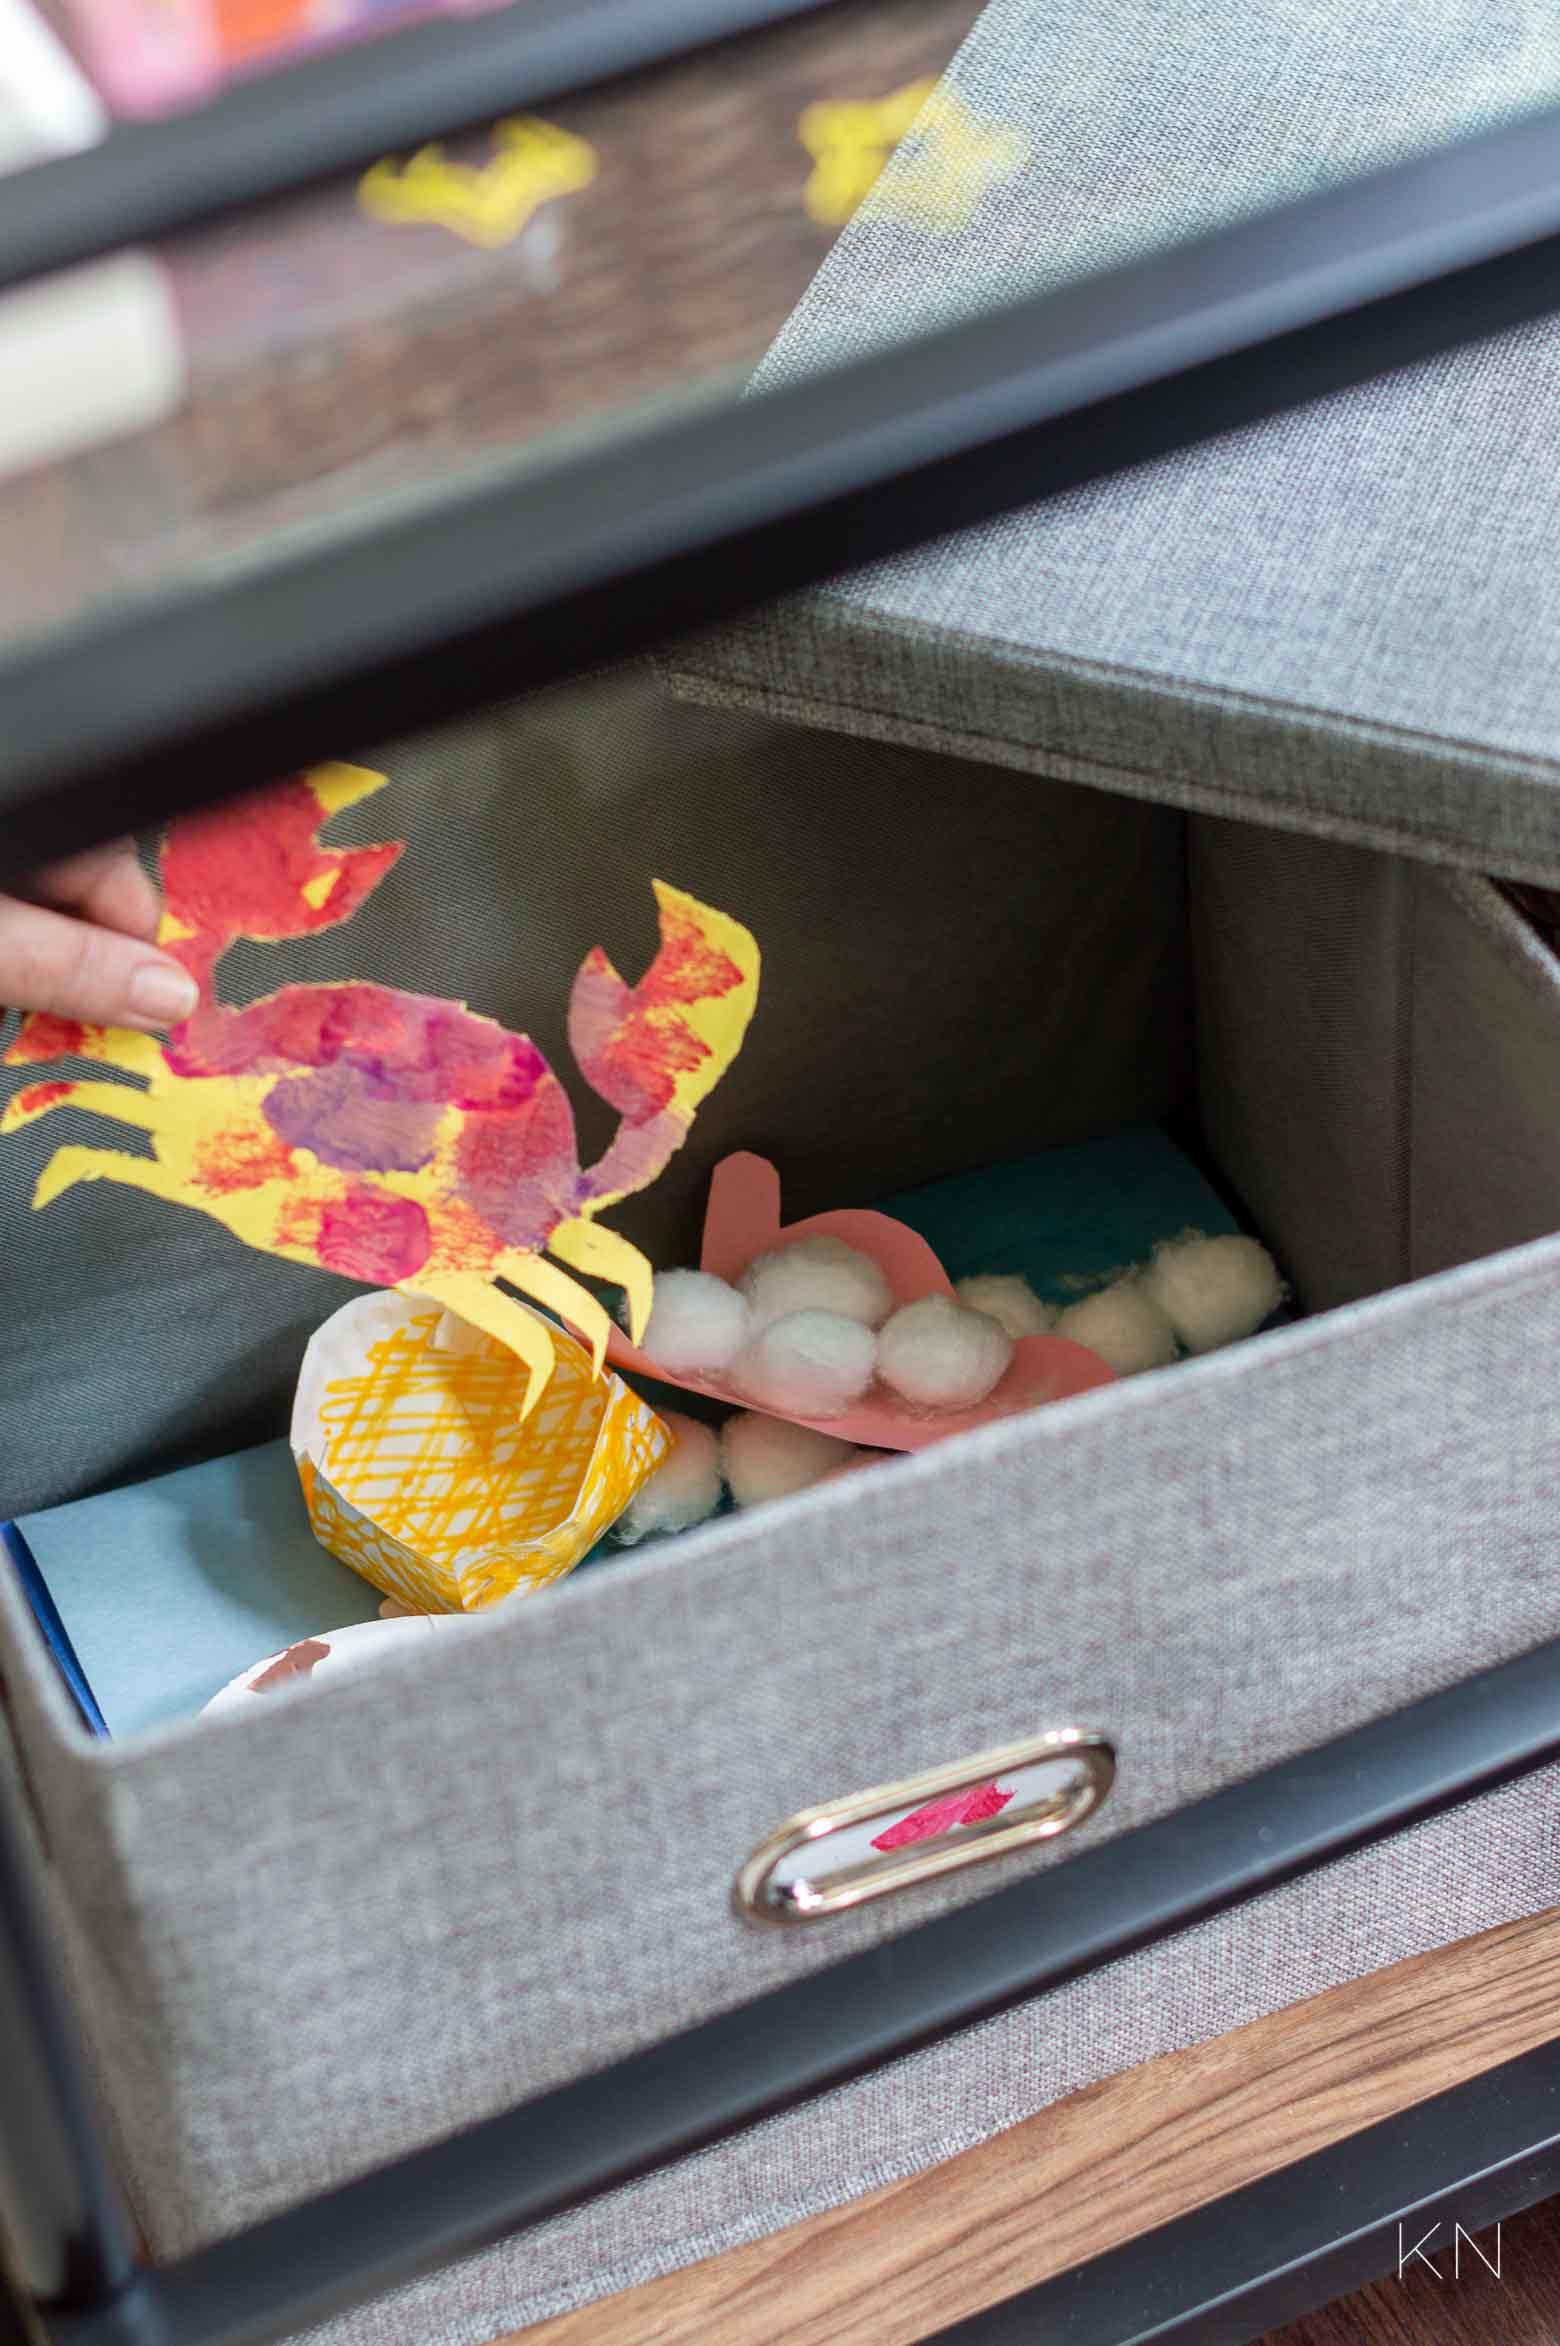 How to Organize Kids Art Supplies & Organization Ideas with Bar Carts